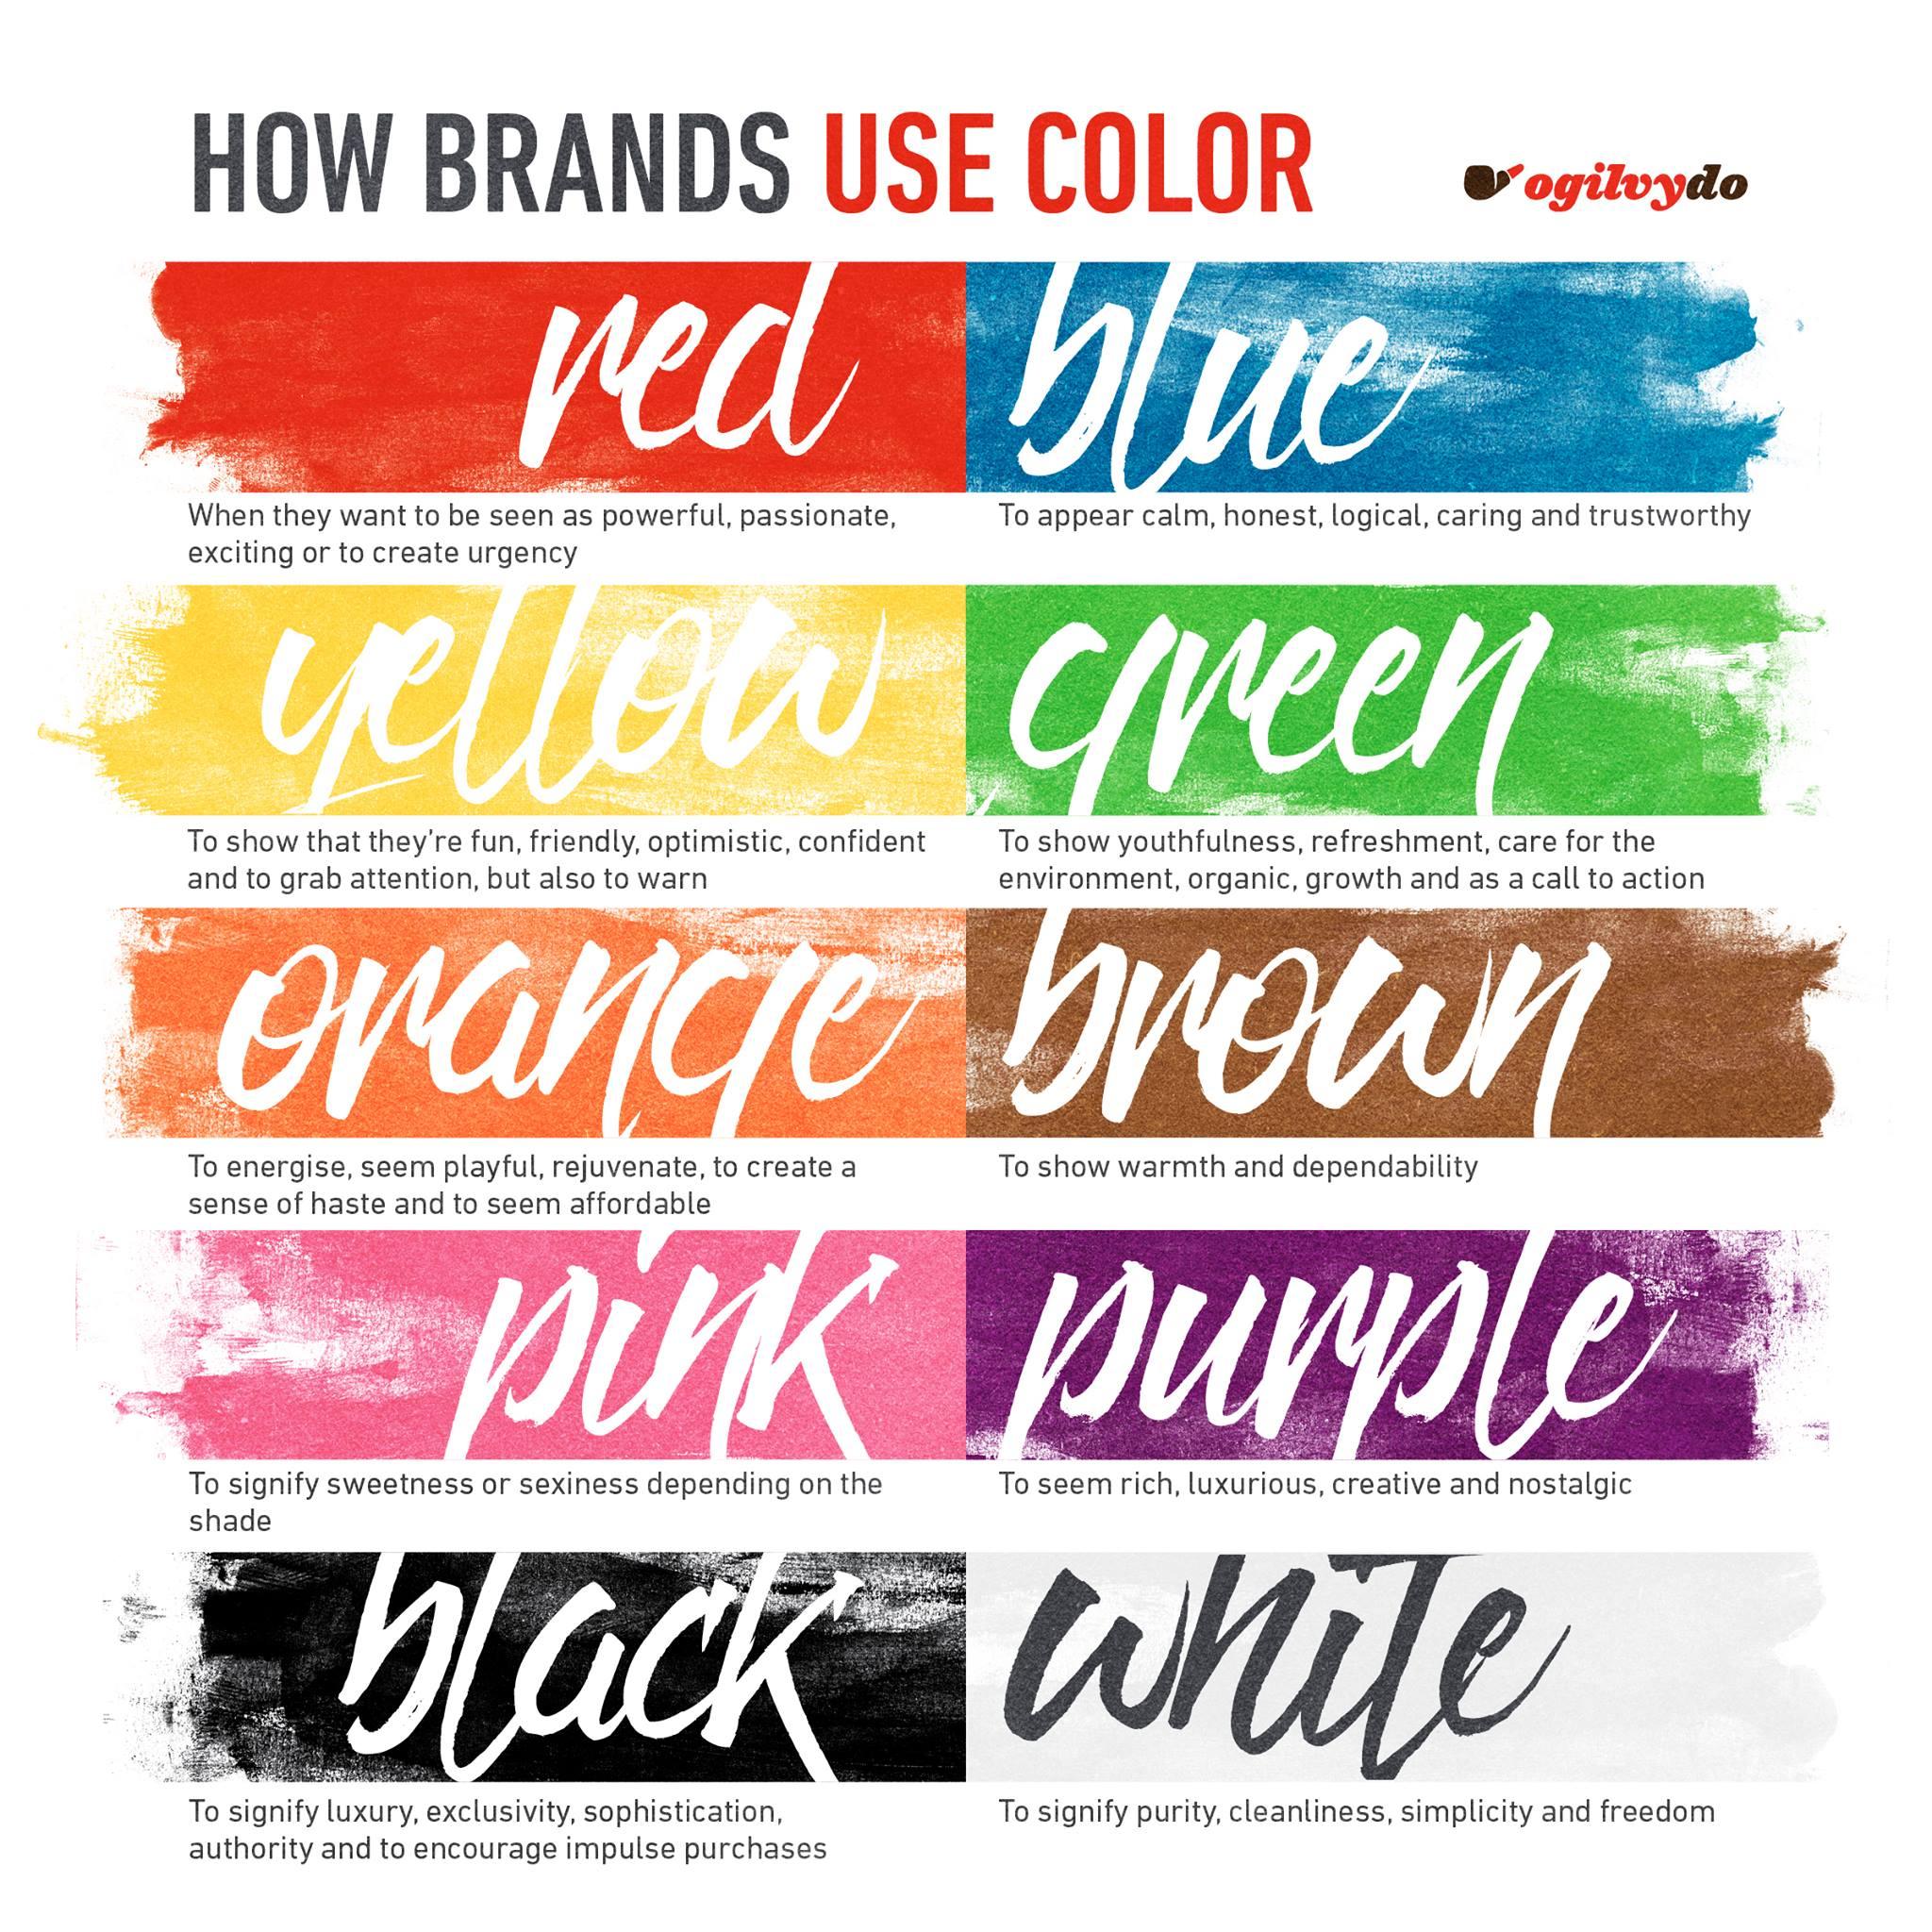 How Brands Use Color via @ogilvydo   Discover more ---> https://t.co/LJy3pqj0T9 https://t.co/P5XSuQ0Spa